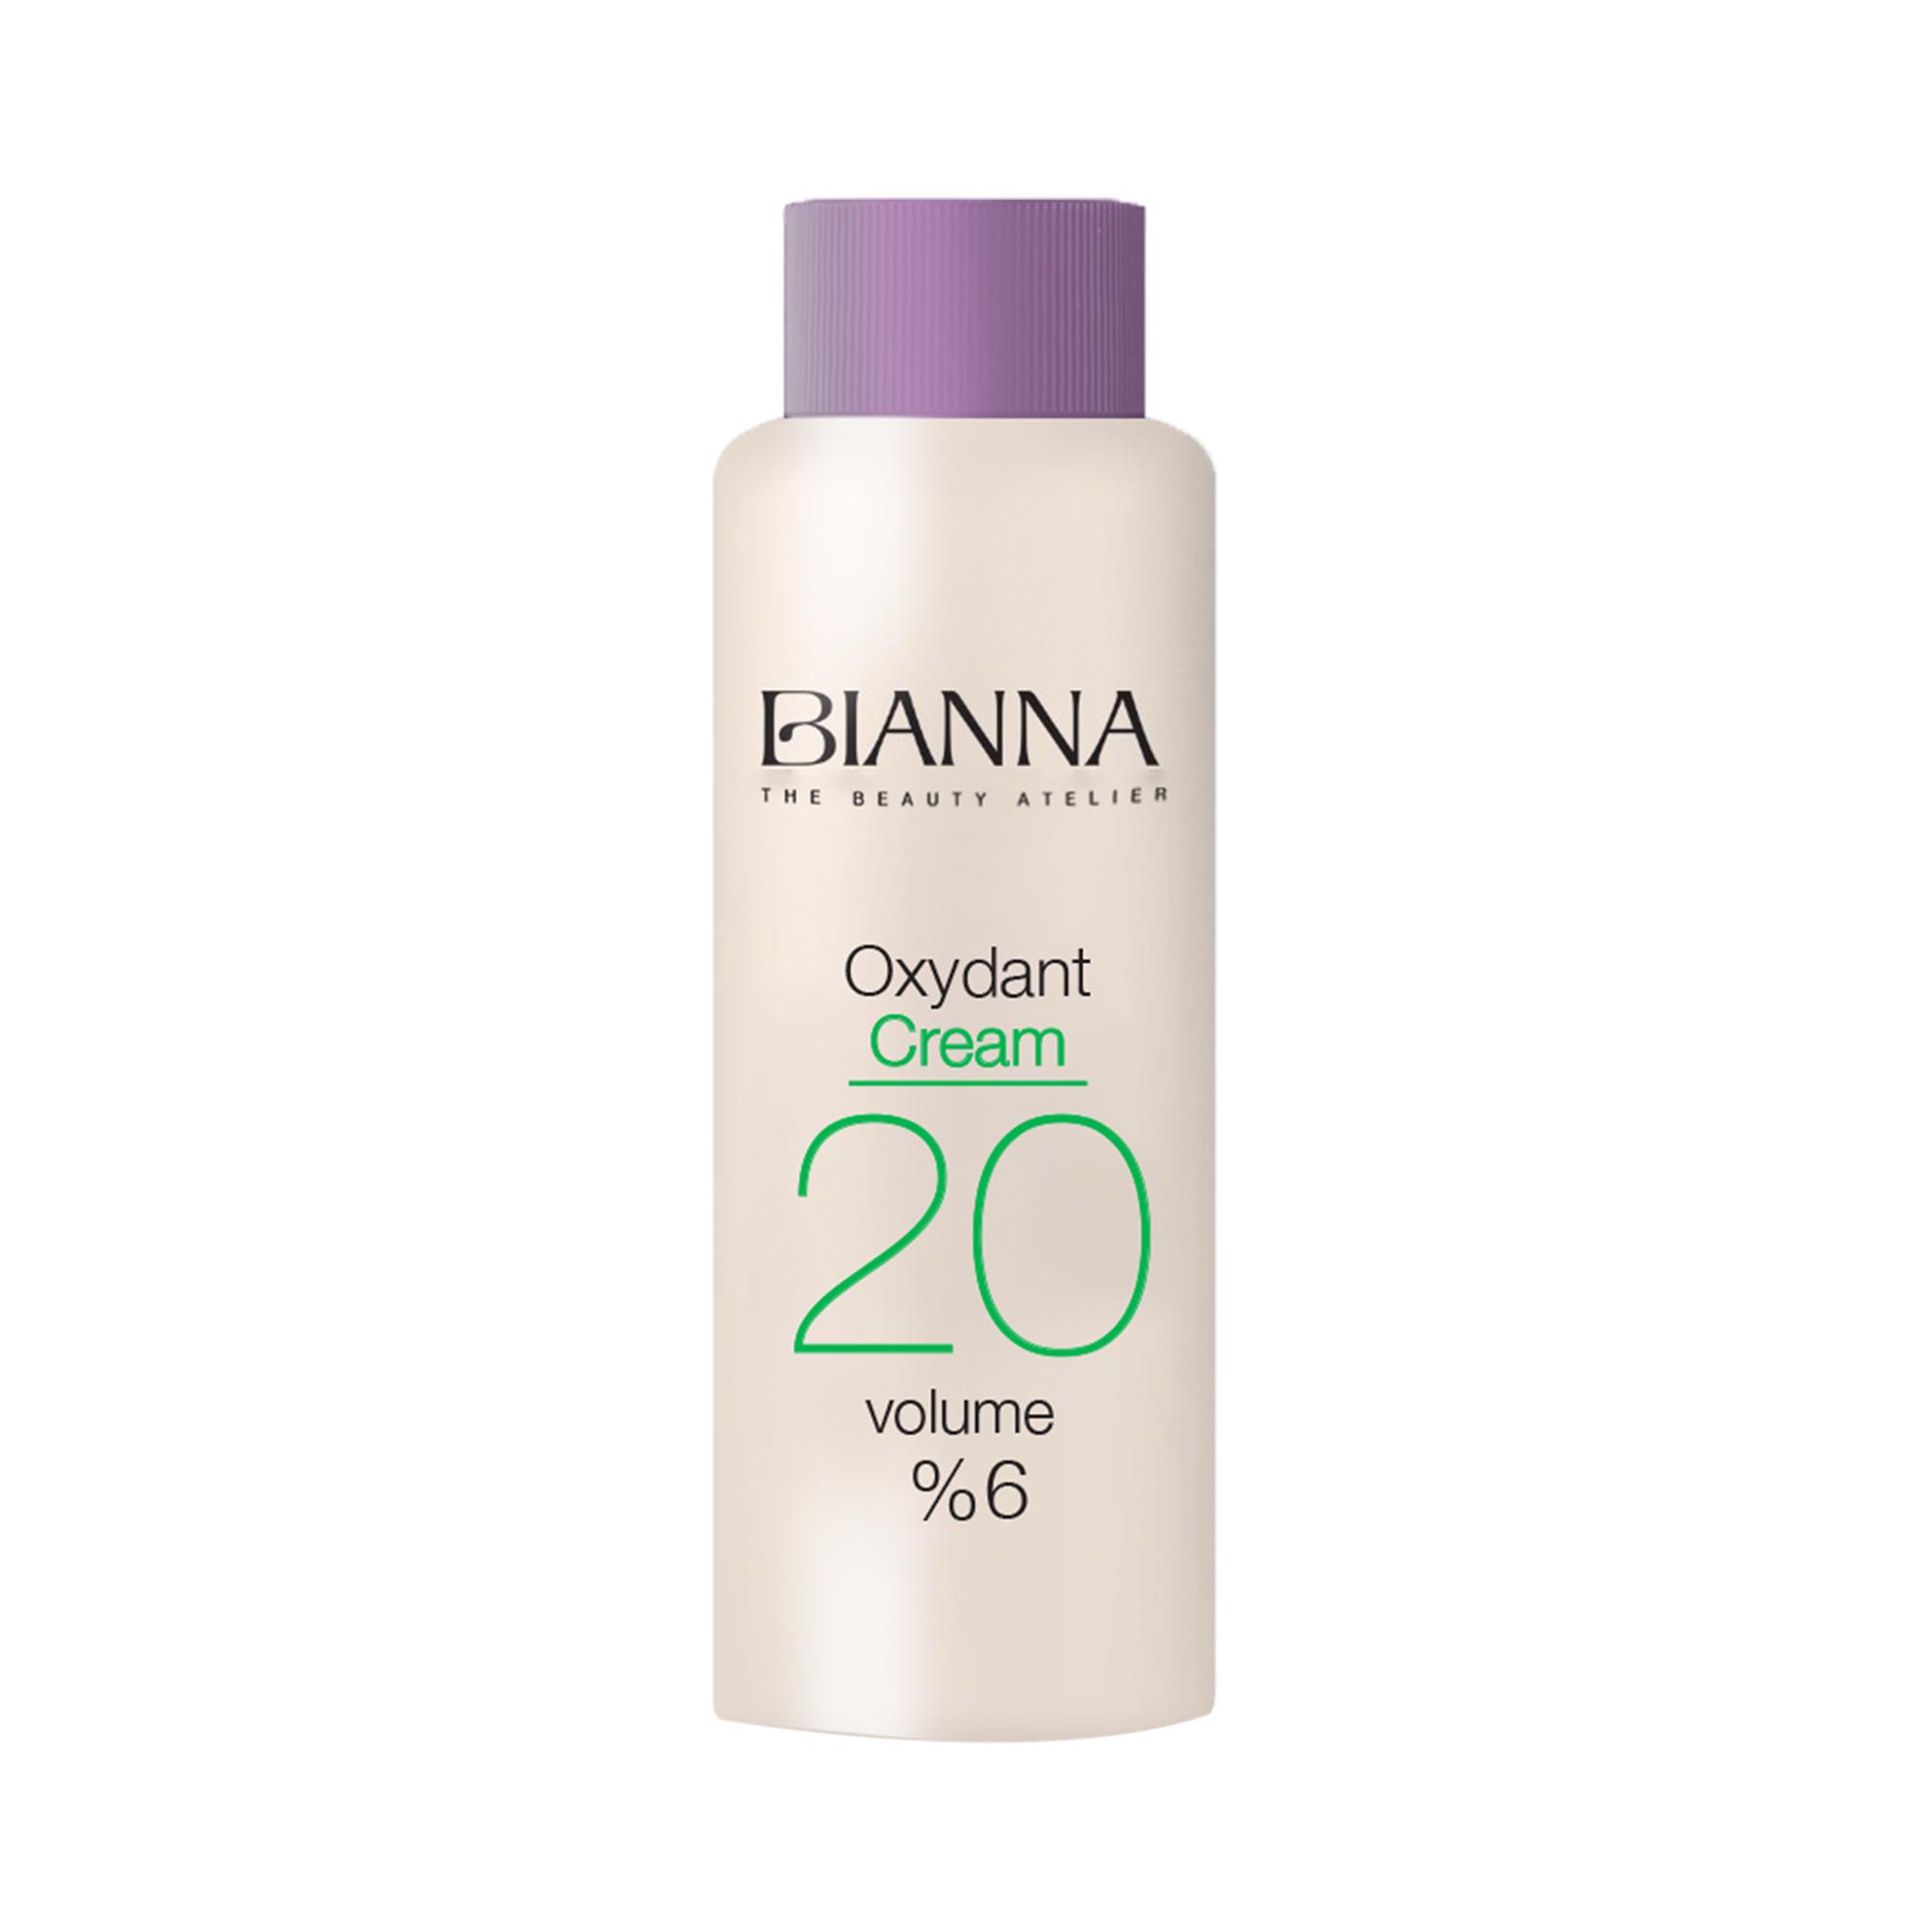 BIANNA OXYDANT CREAM 20VOL / 4219-21